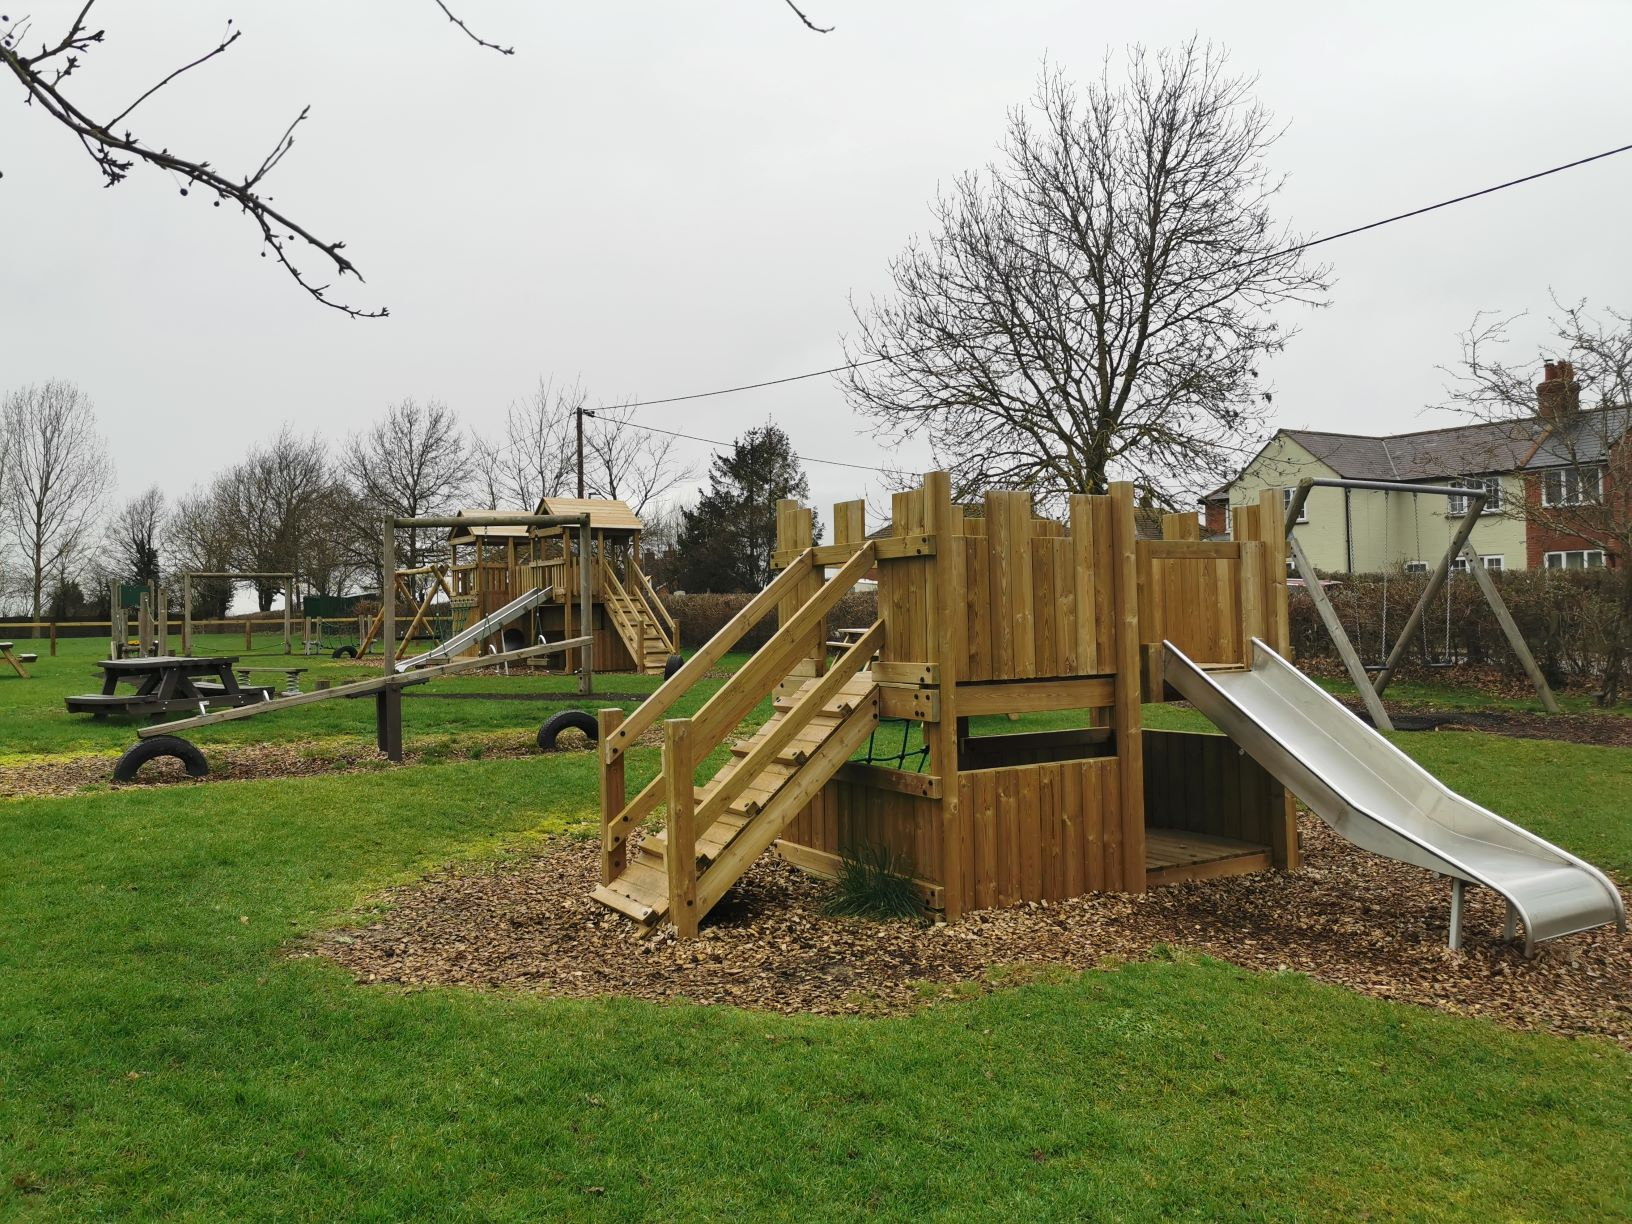 Towersey Play Park